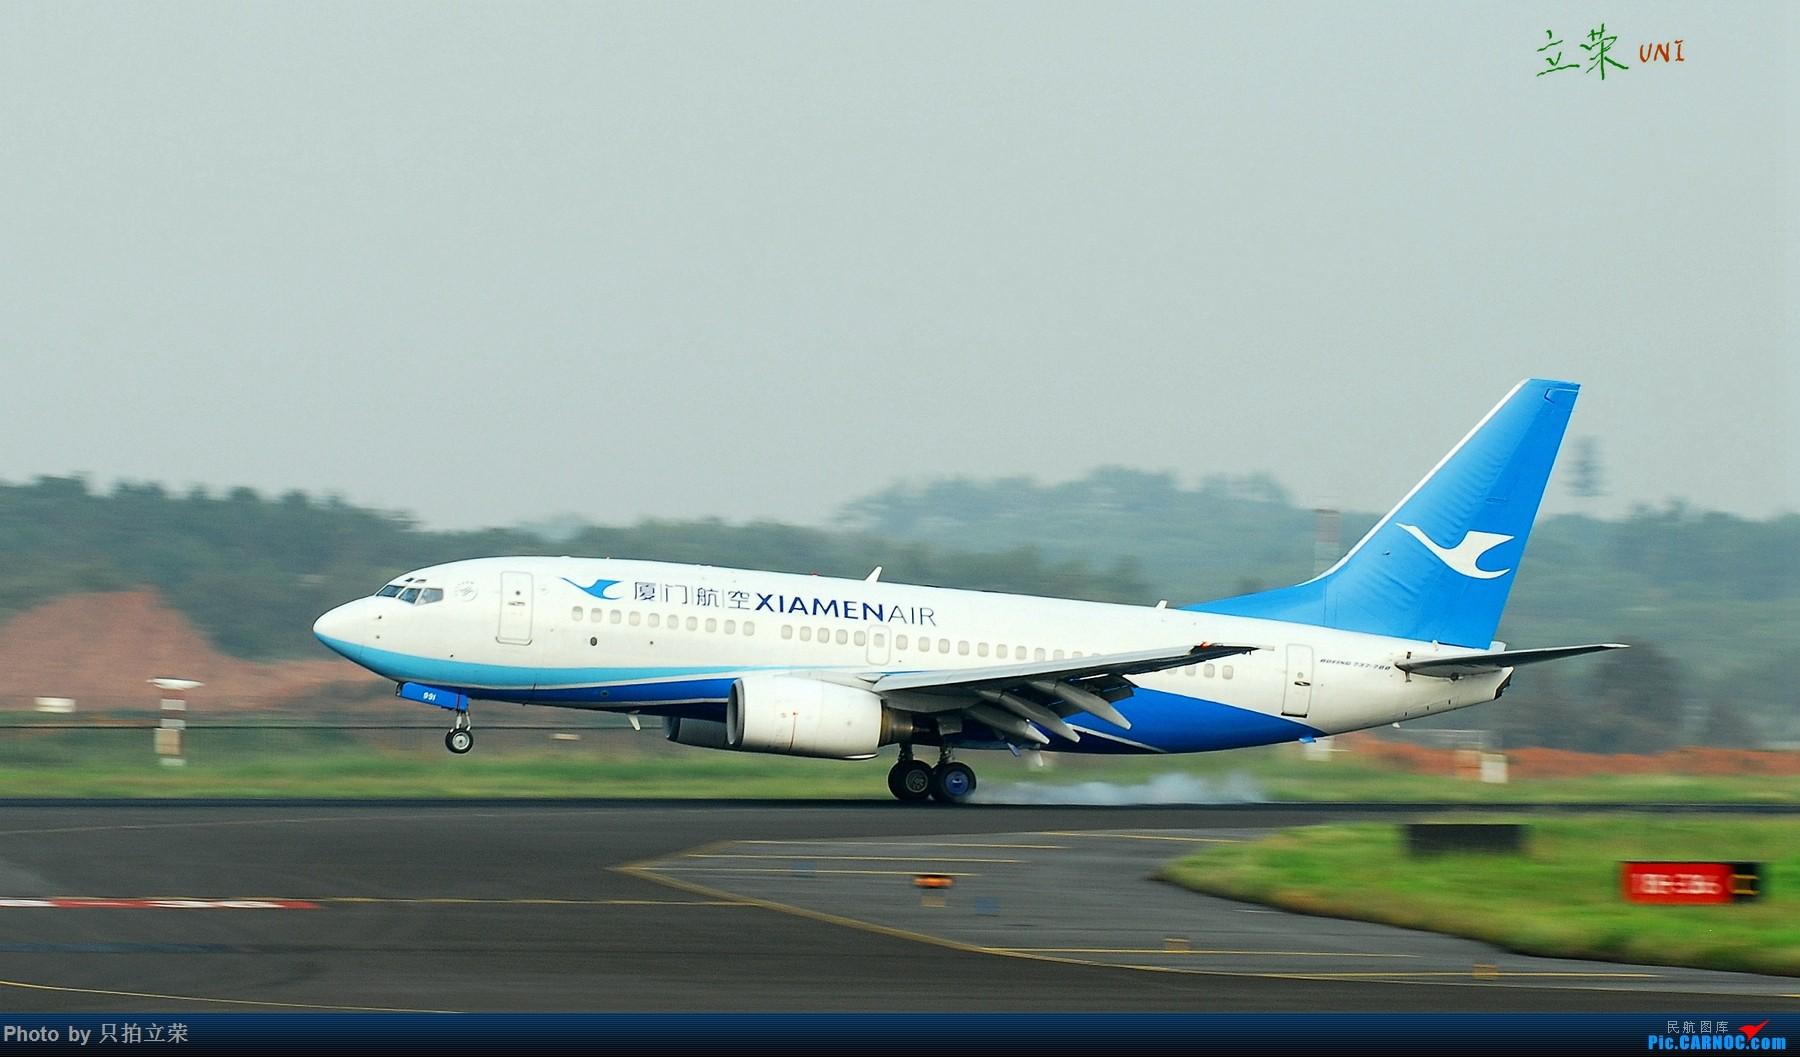 Re:[原创]长沙黄花机场73G/737-700擦烟小集锦 BOEING 737-700 B-2991 中国长沙黄花国际机场